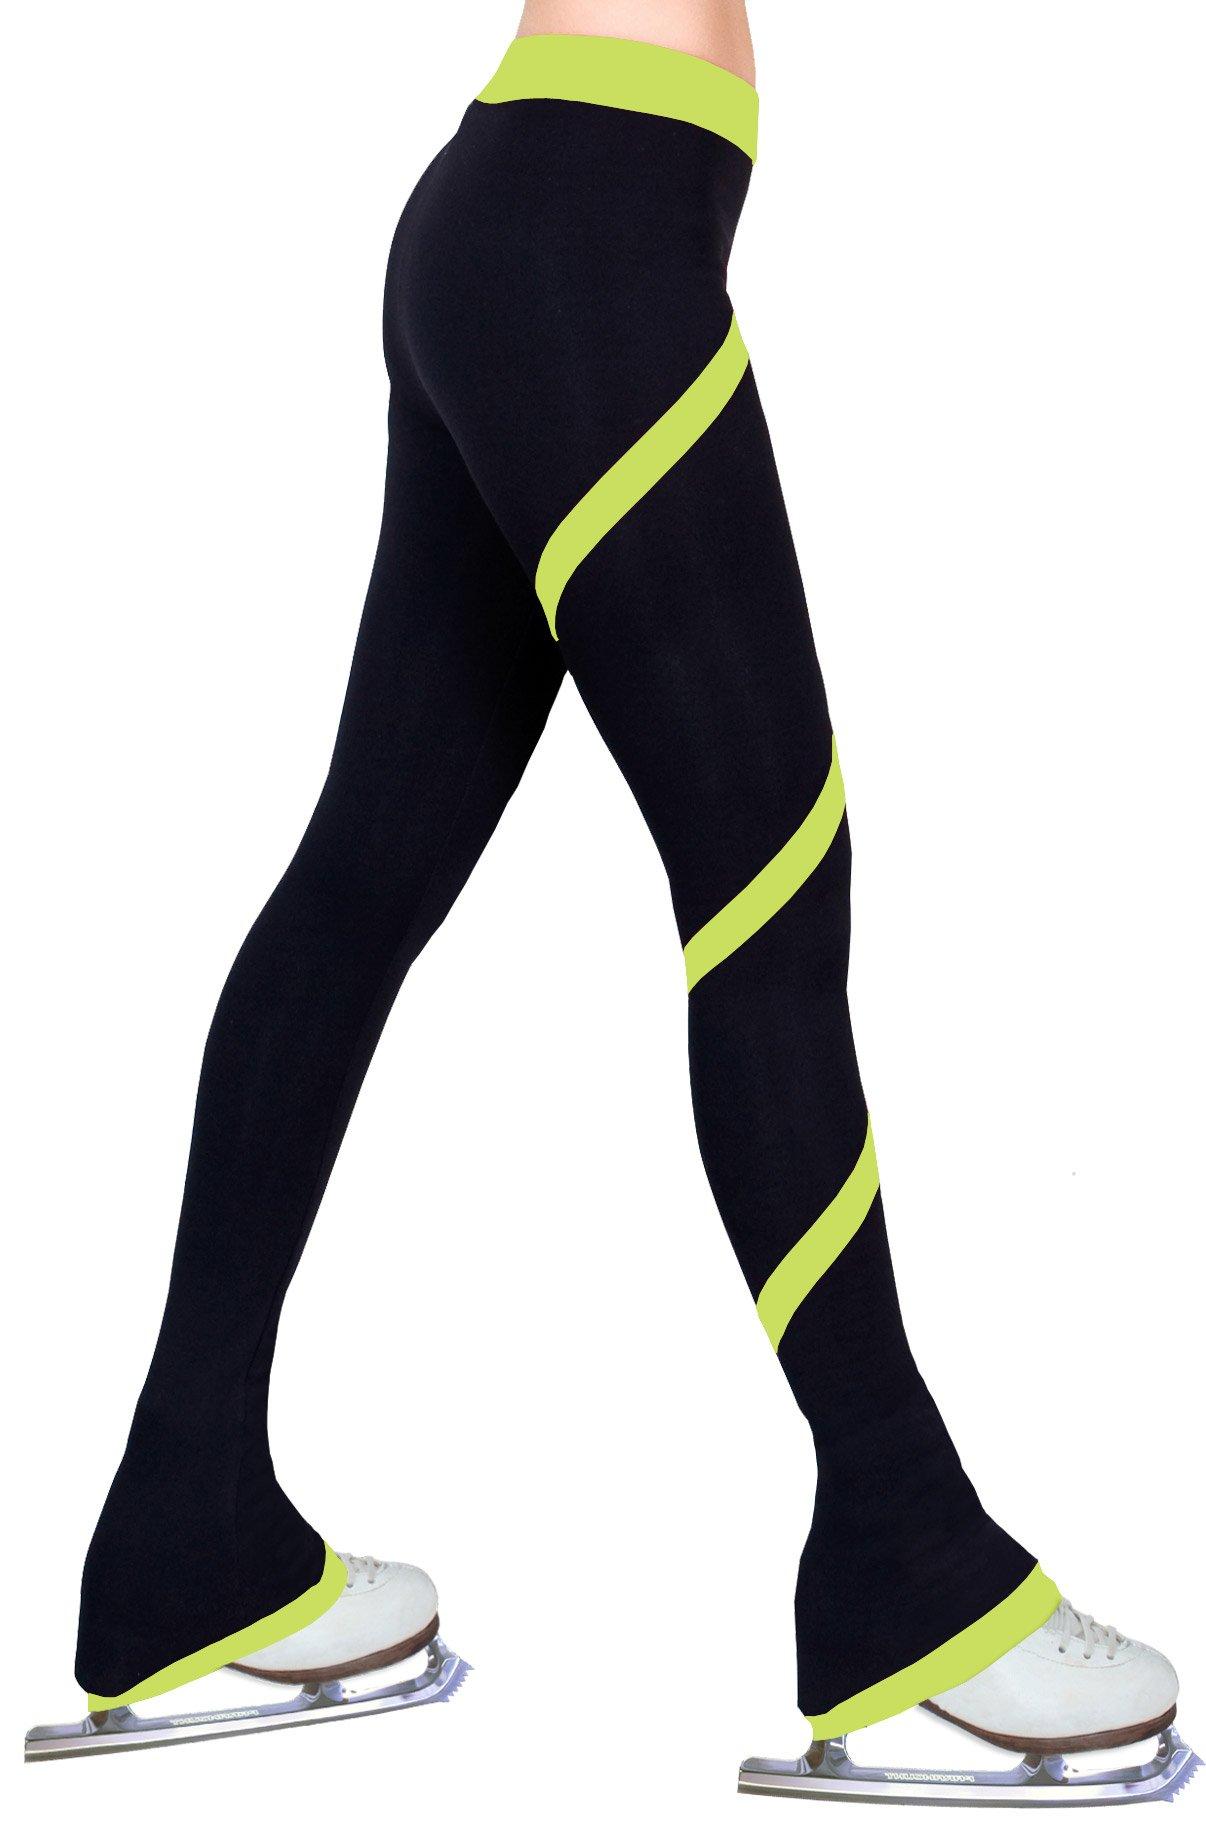 ny2 Sportswear Figure Skating Spiral Polartec Polar Fleece Pants (Lime, Child Extra Small) by ny2 Sportswear